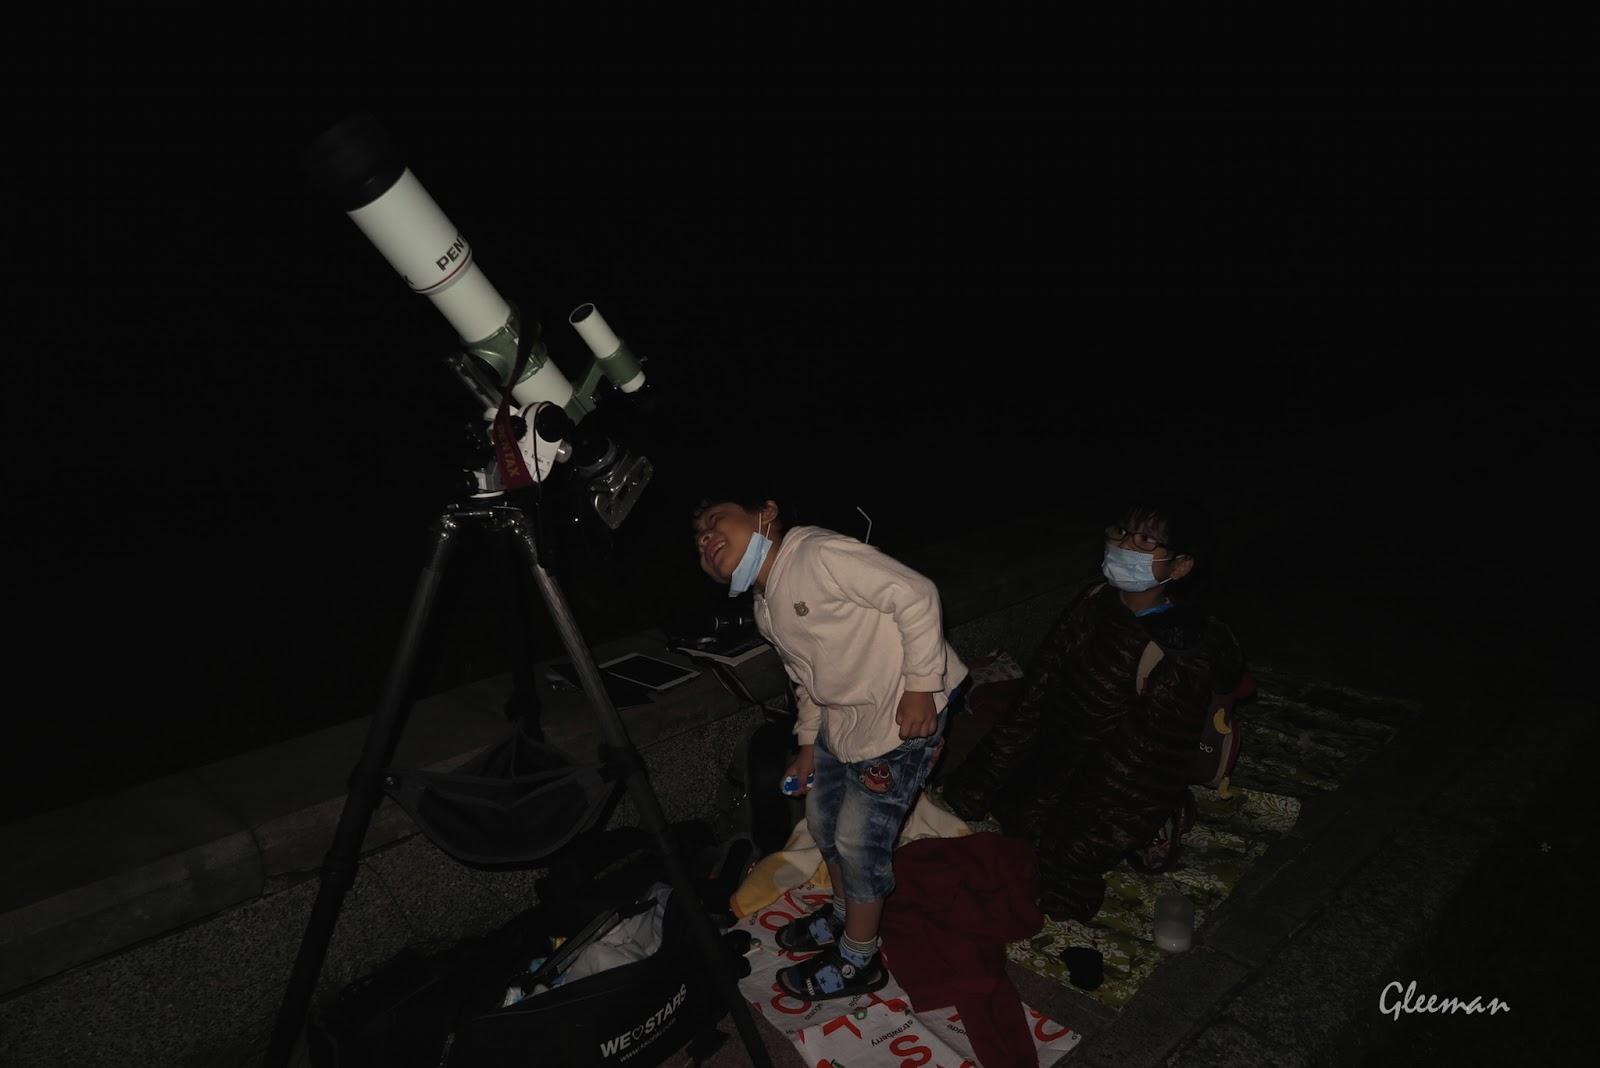 Pentax O-GPS1(How to):Telescope setup (Pentax 75SDHF FL=500mm)